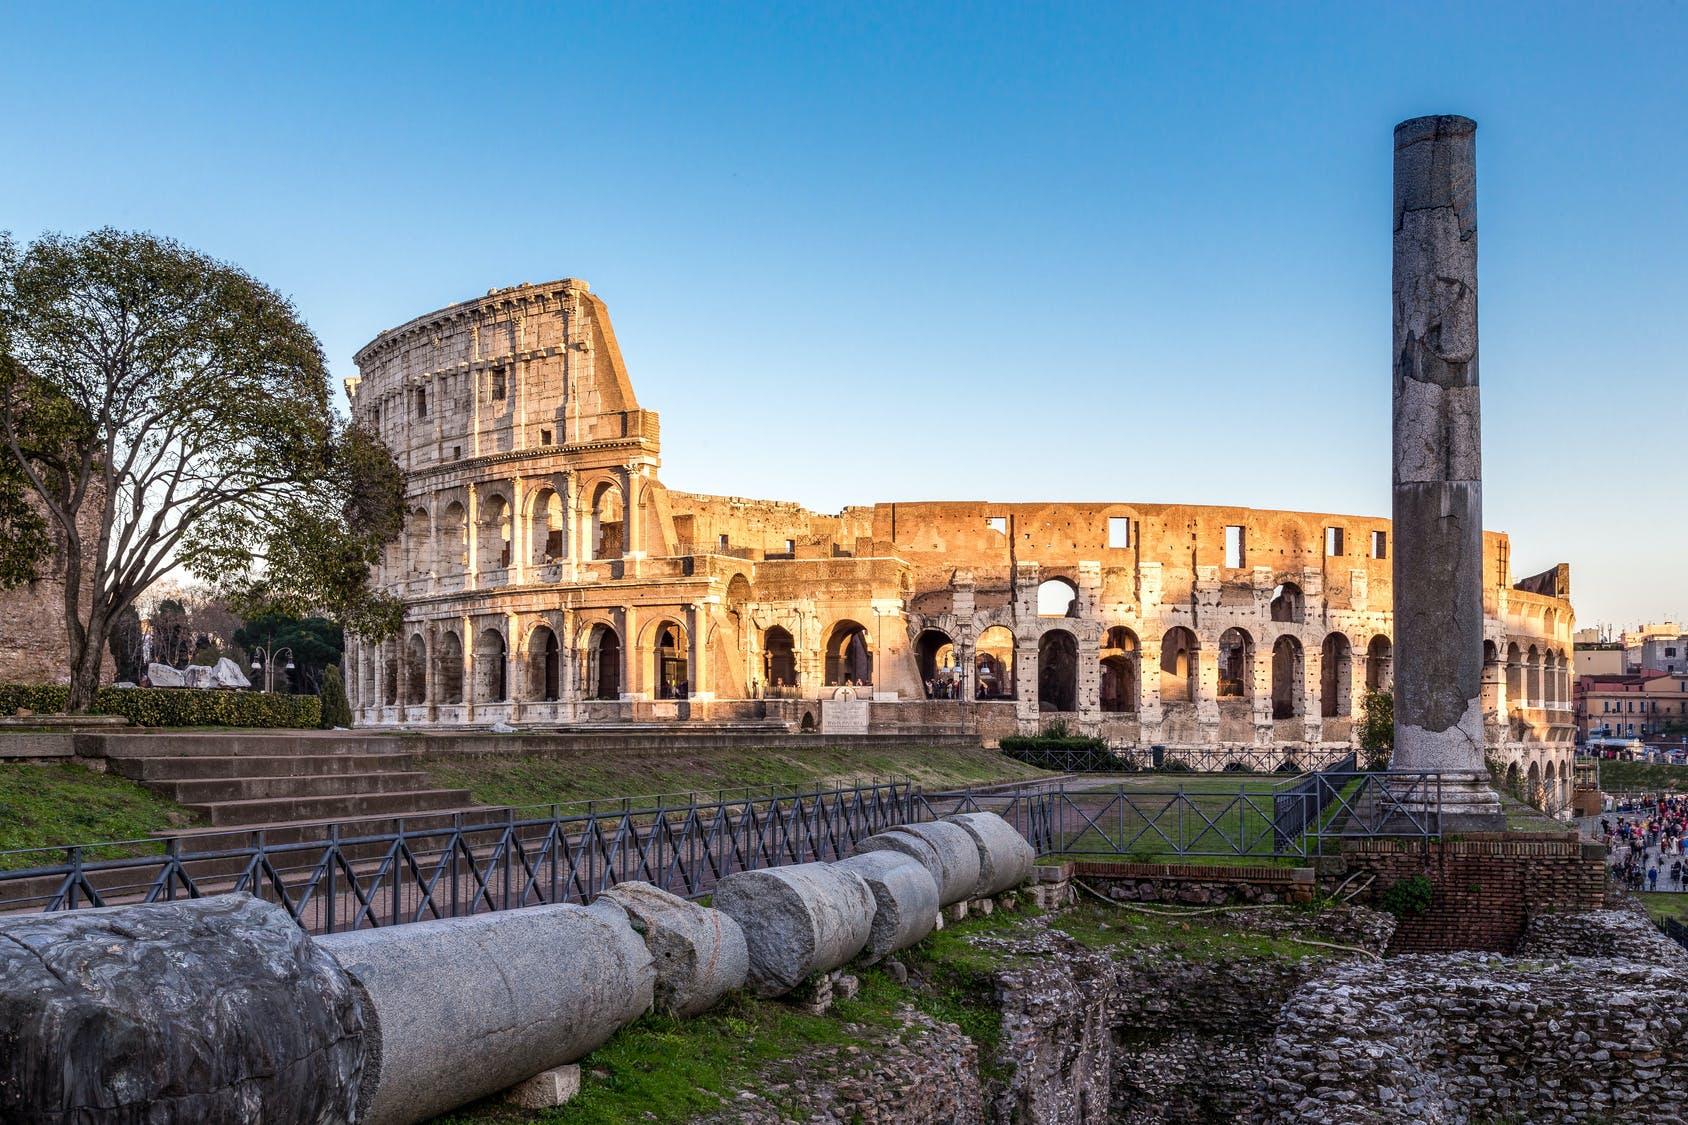 Ver la ciudad,City tours,Ver la ciudad,City tours,Tours andando,Walking tours,Tours históricos y culturales,Historical & Cultural tours,Palatino,Palatine,Visita guiada,Coliseo,Colosseum,Foro Romano,Forum